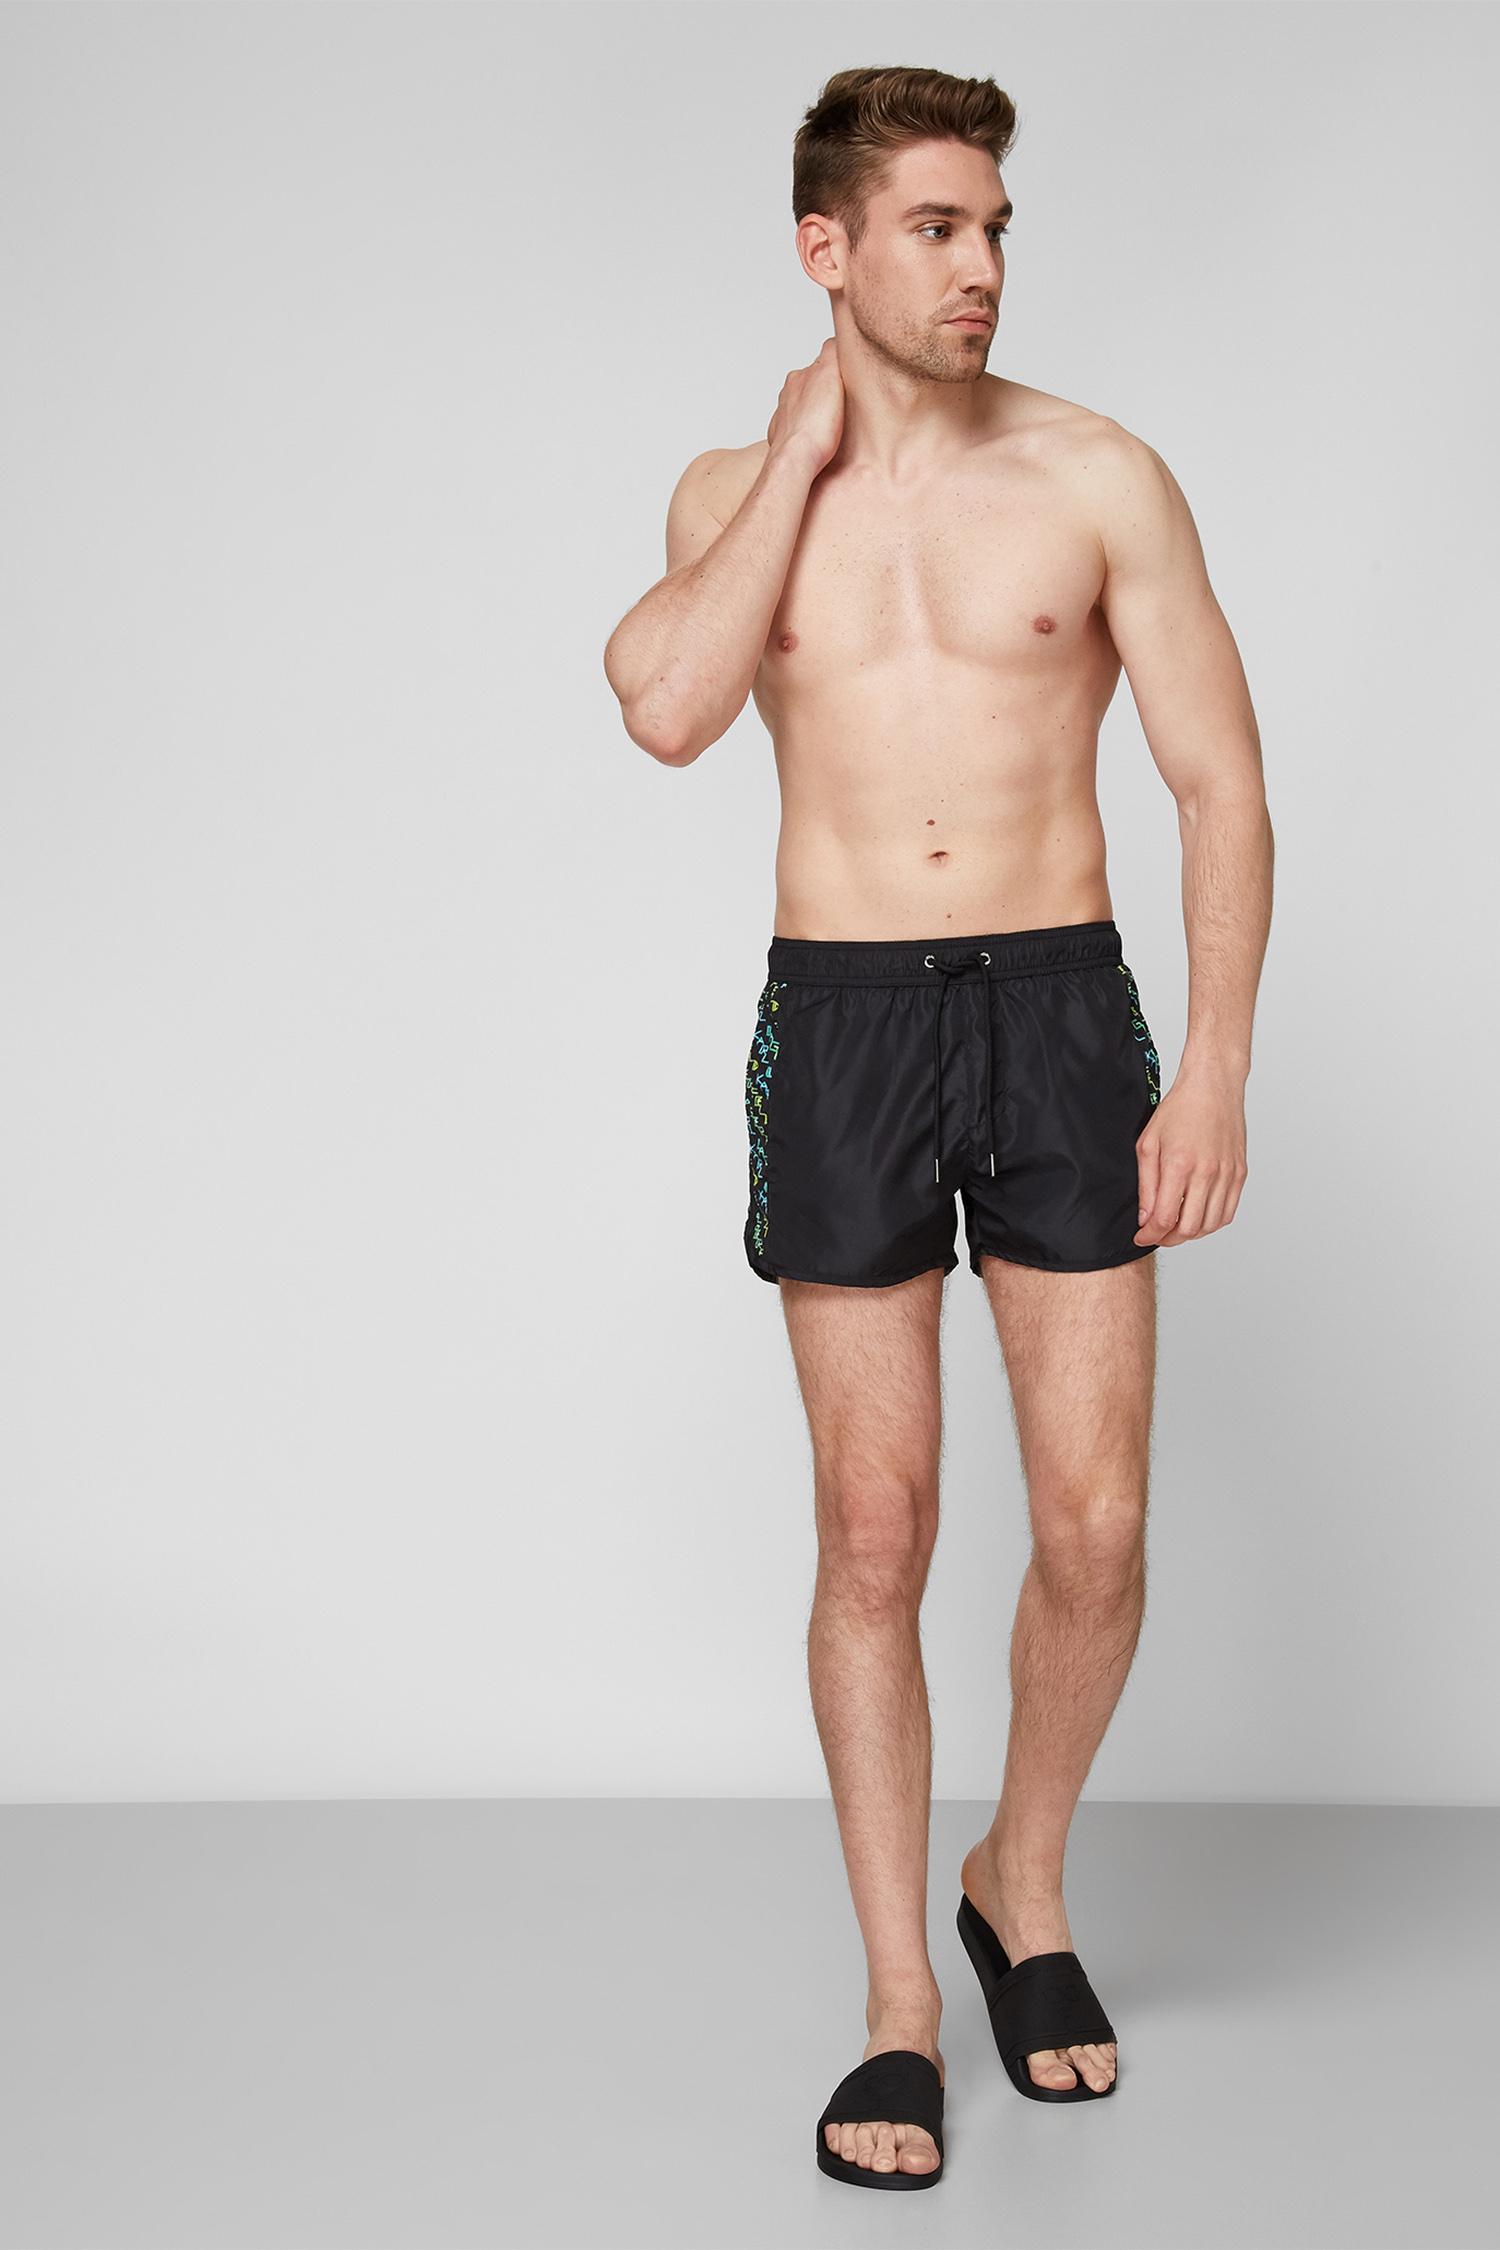 Мужские черные плавательные шорты Karl Lagerfeld KL21MBS05;GREEN/YELLOW